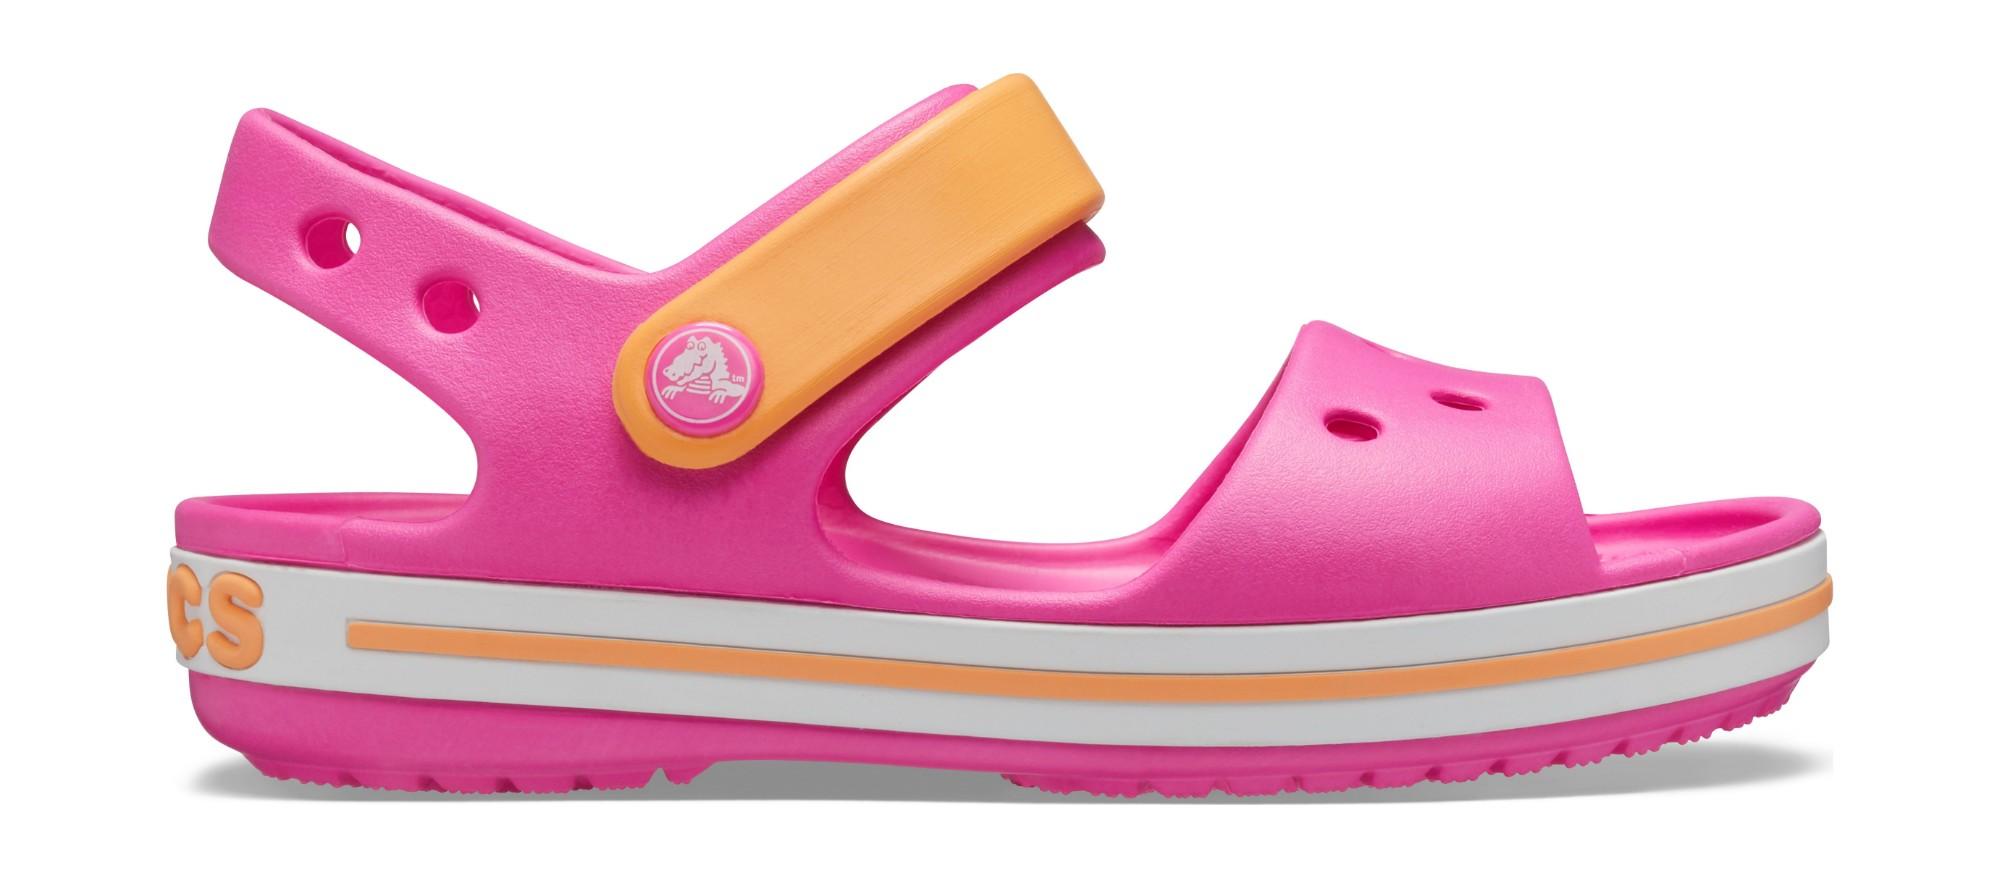 Crocs™ Kids' Crocband Sandal Electric Pink/Cantaloupe 33,5